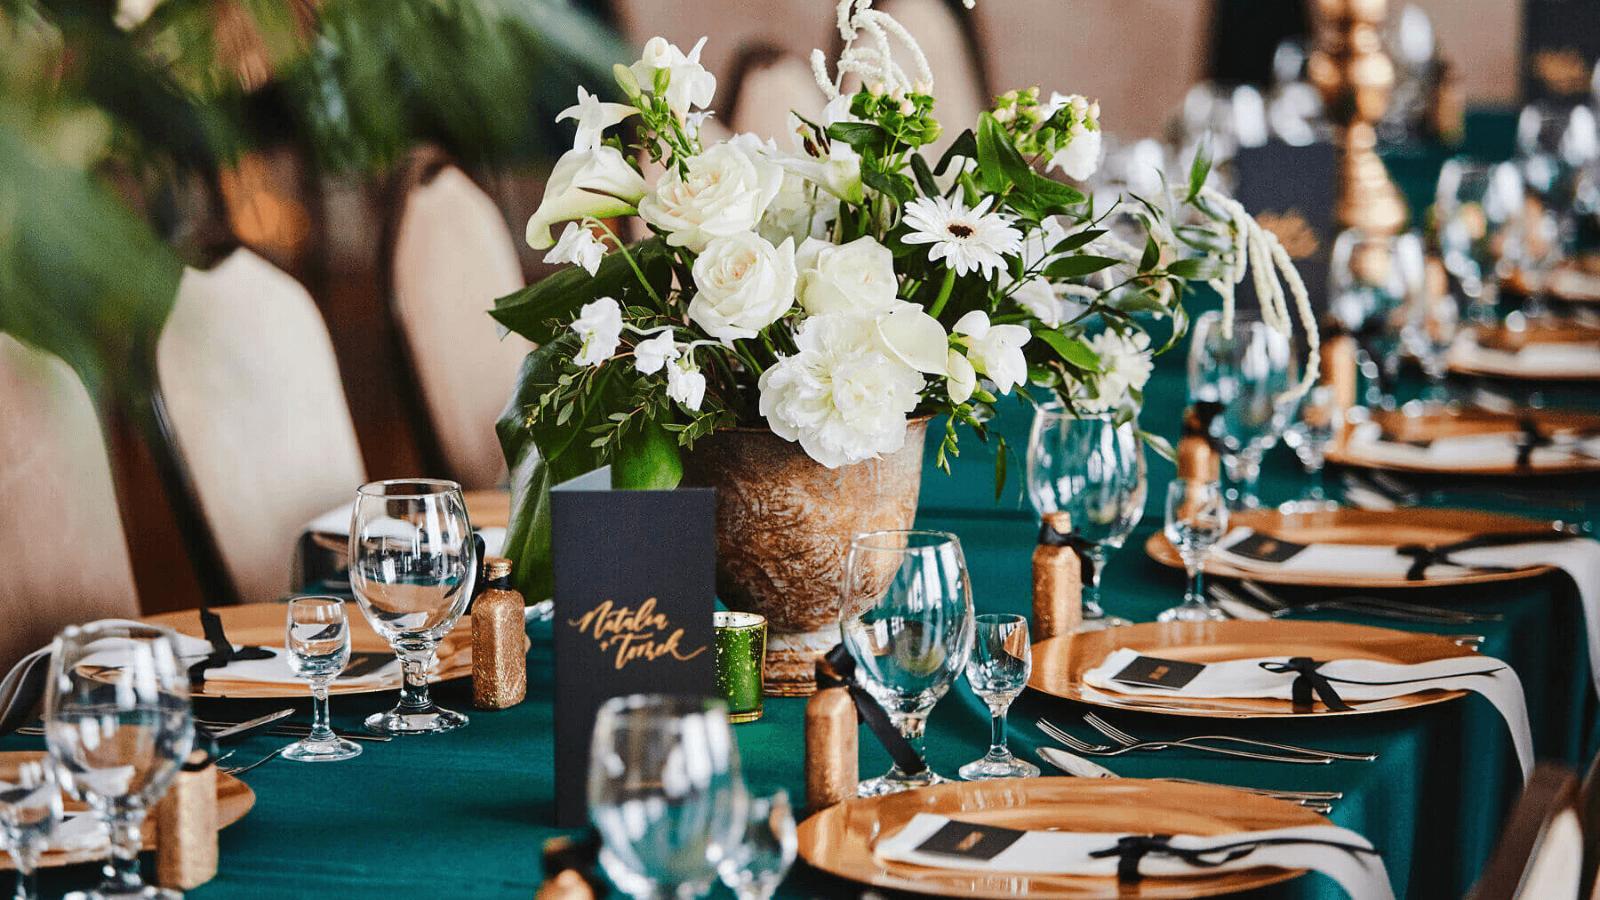 dekoracje Natlia Czop inLove / Design Your Wedding